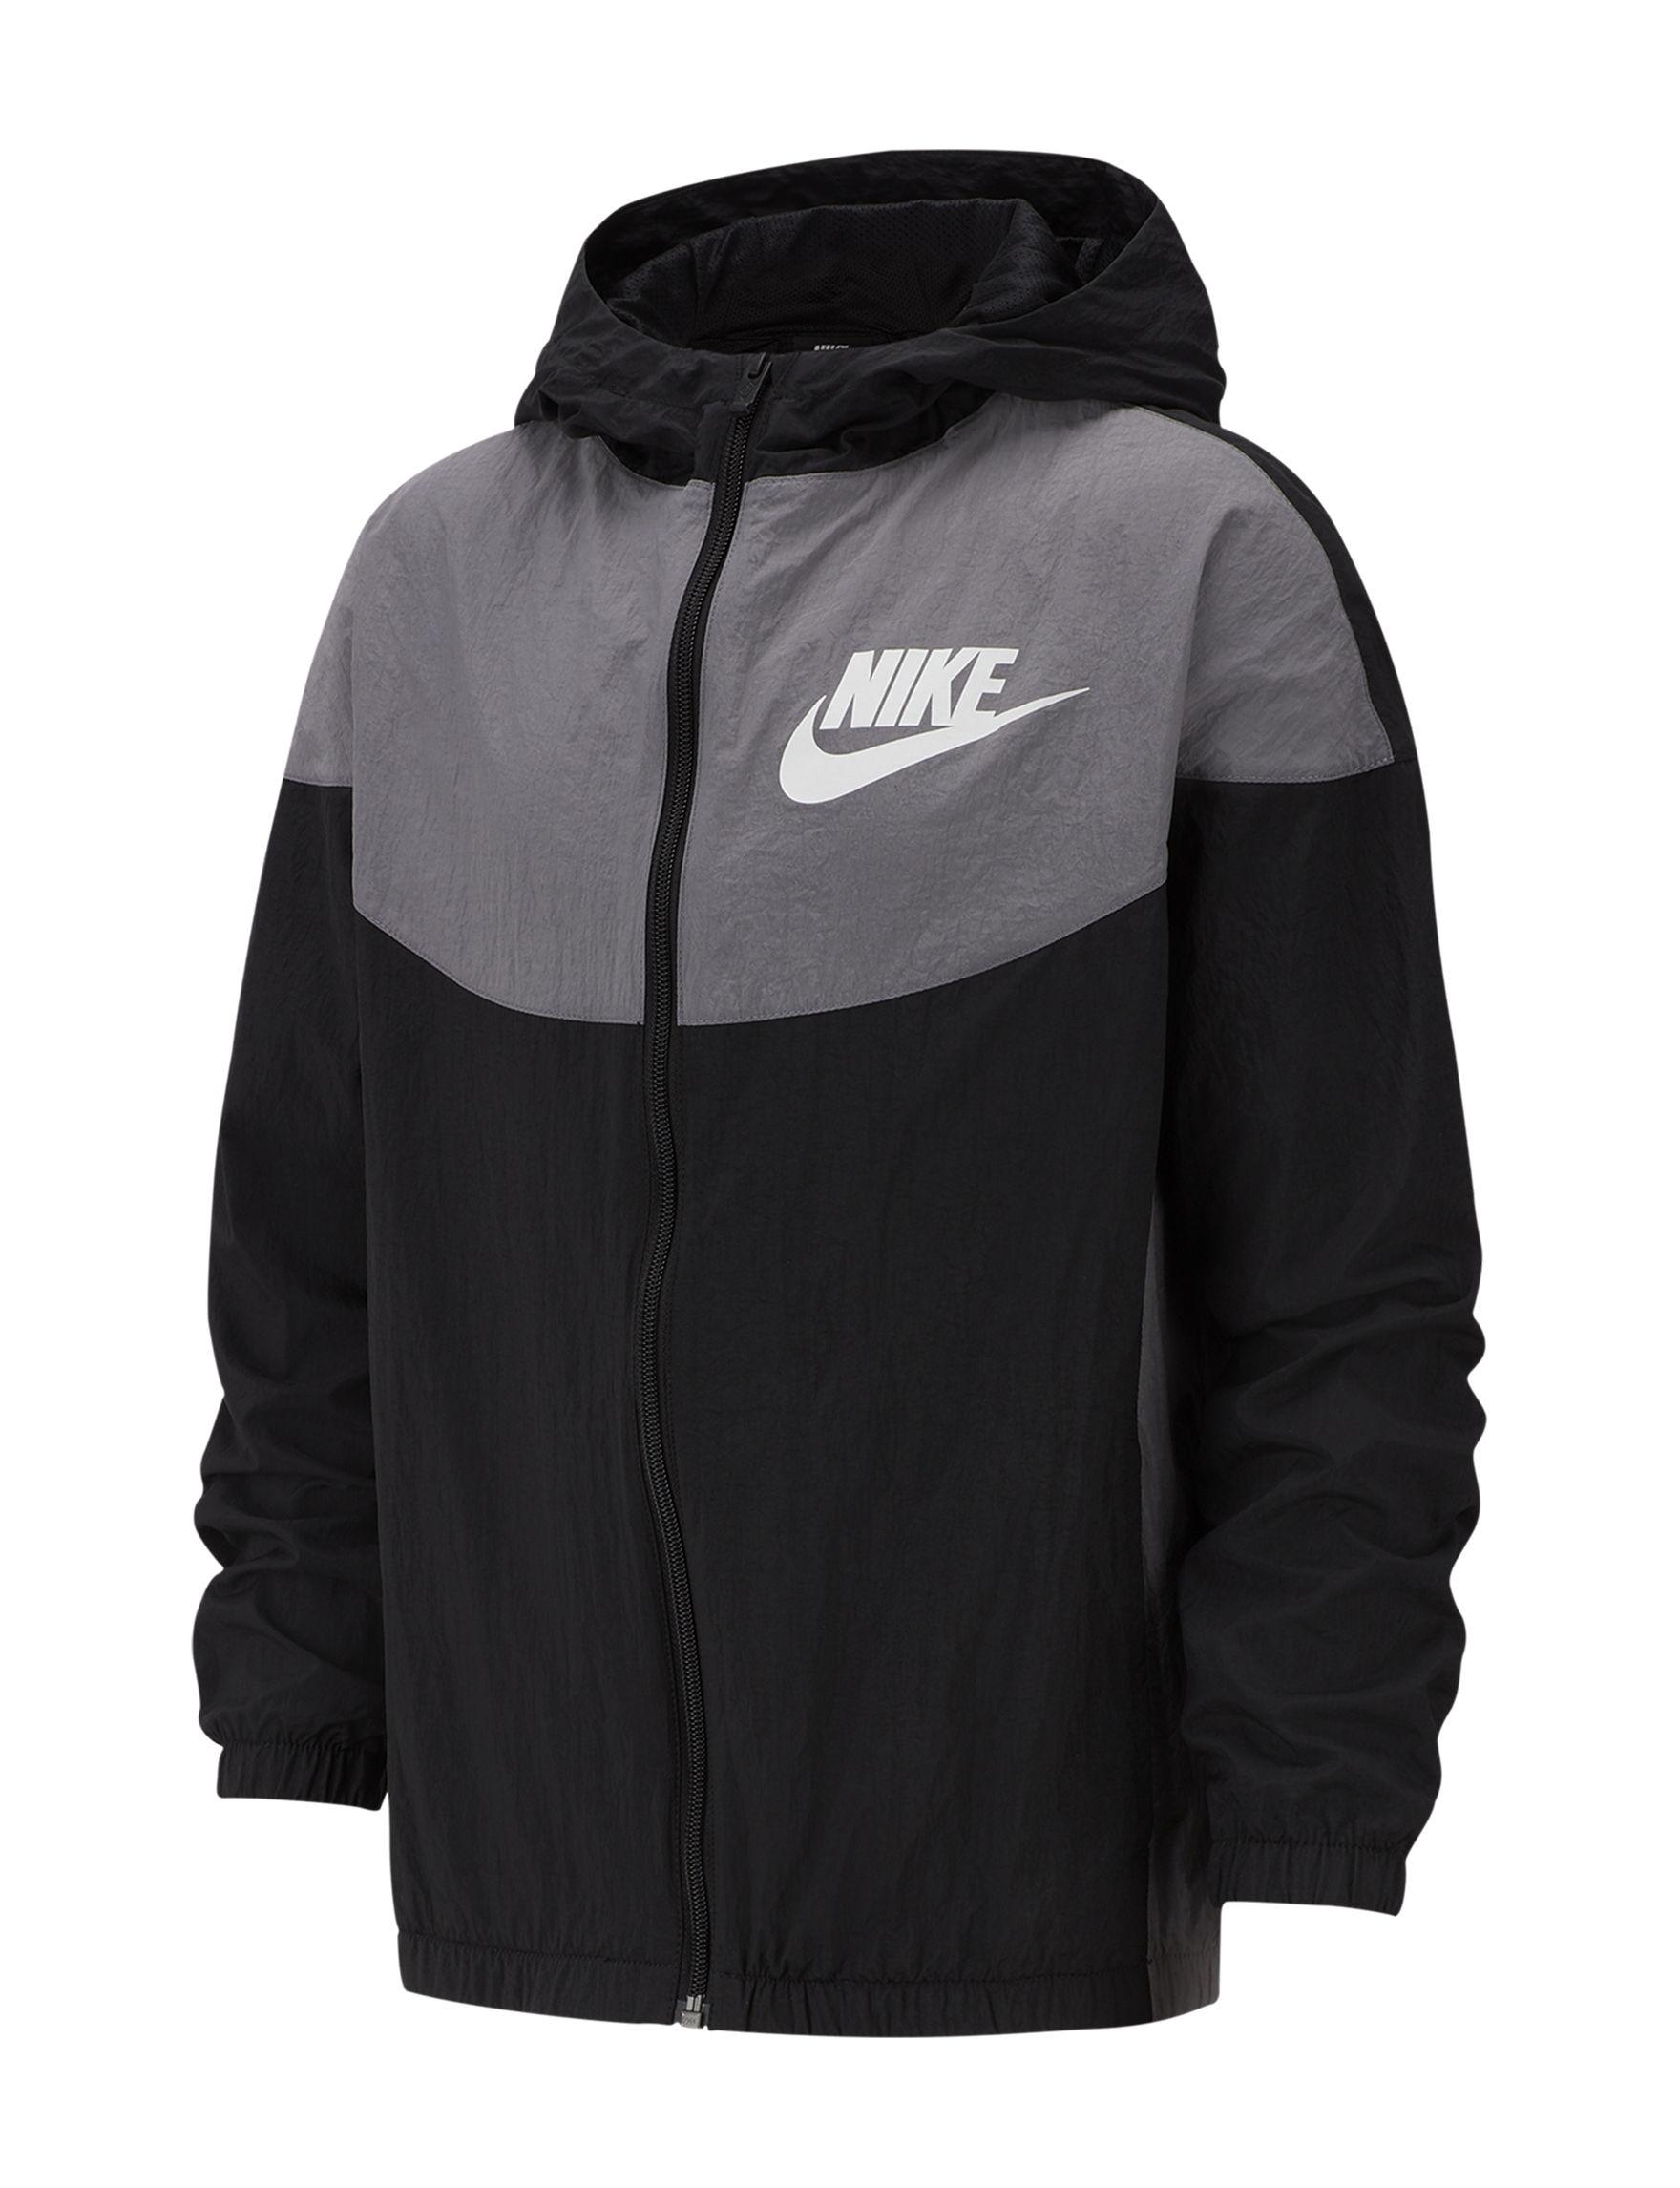 Nike Black / Grey Fleece & Soft Shell Jackets